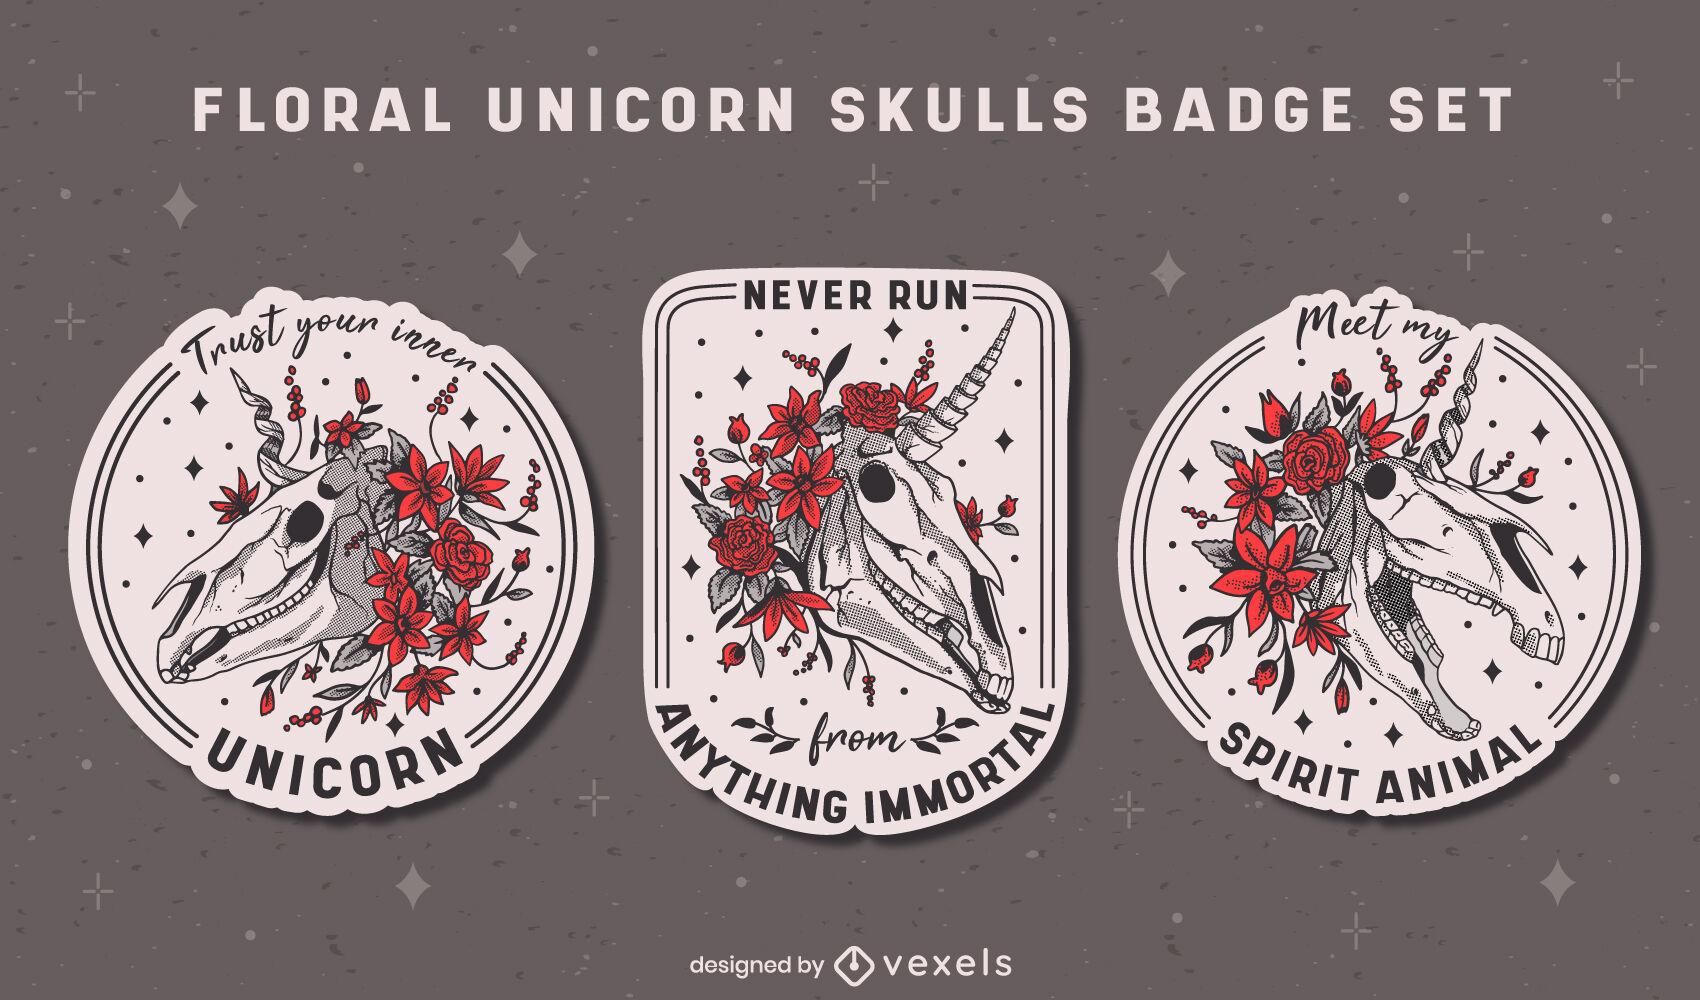 Conjunto de emblemas de crânios de criaturas de unicórnio floral